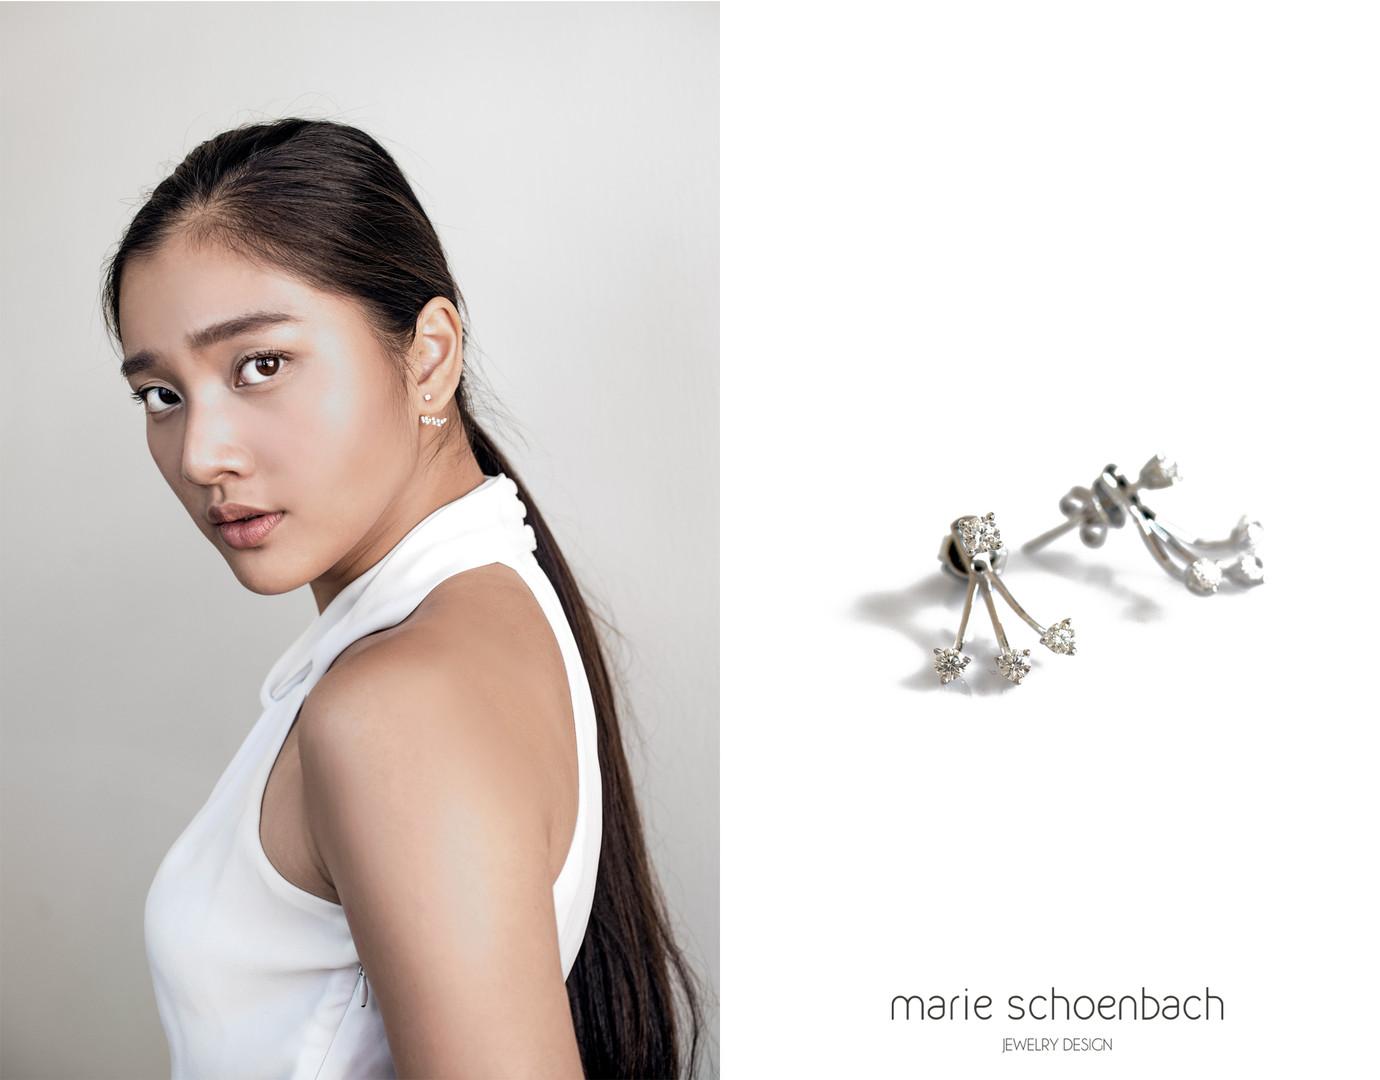 Marie Schoenbach Jewelry